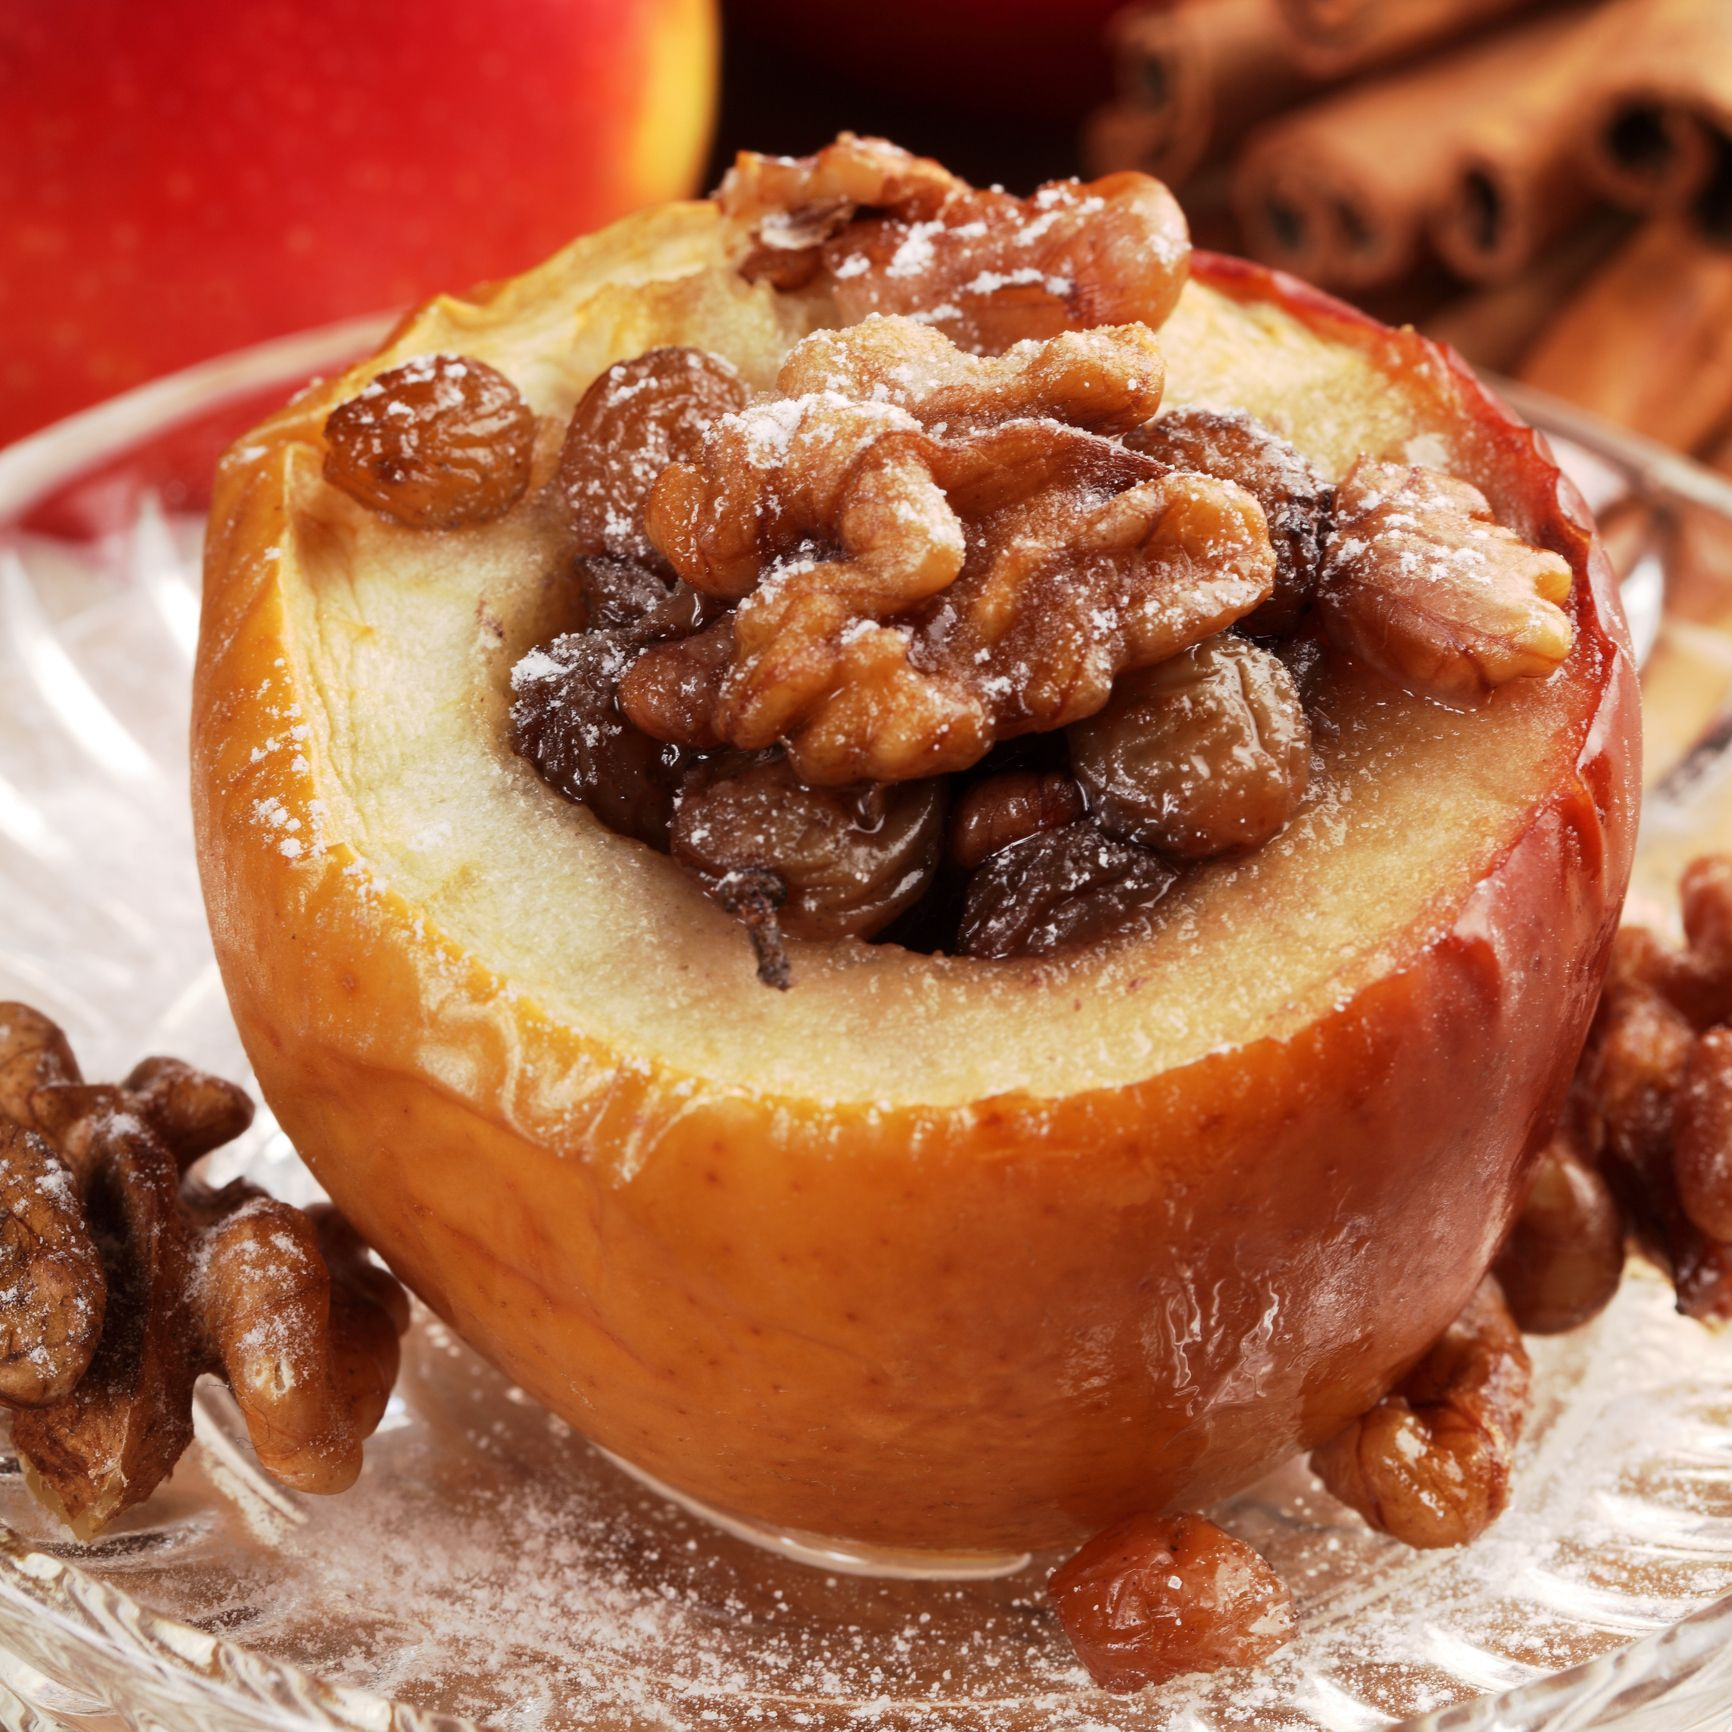 Air Fryer Baked Apple Recipe Air fryer recipes, Apple